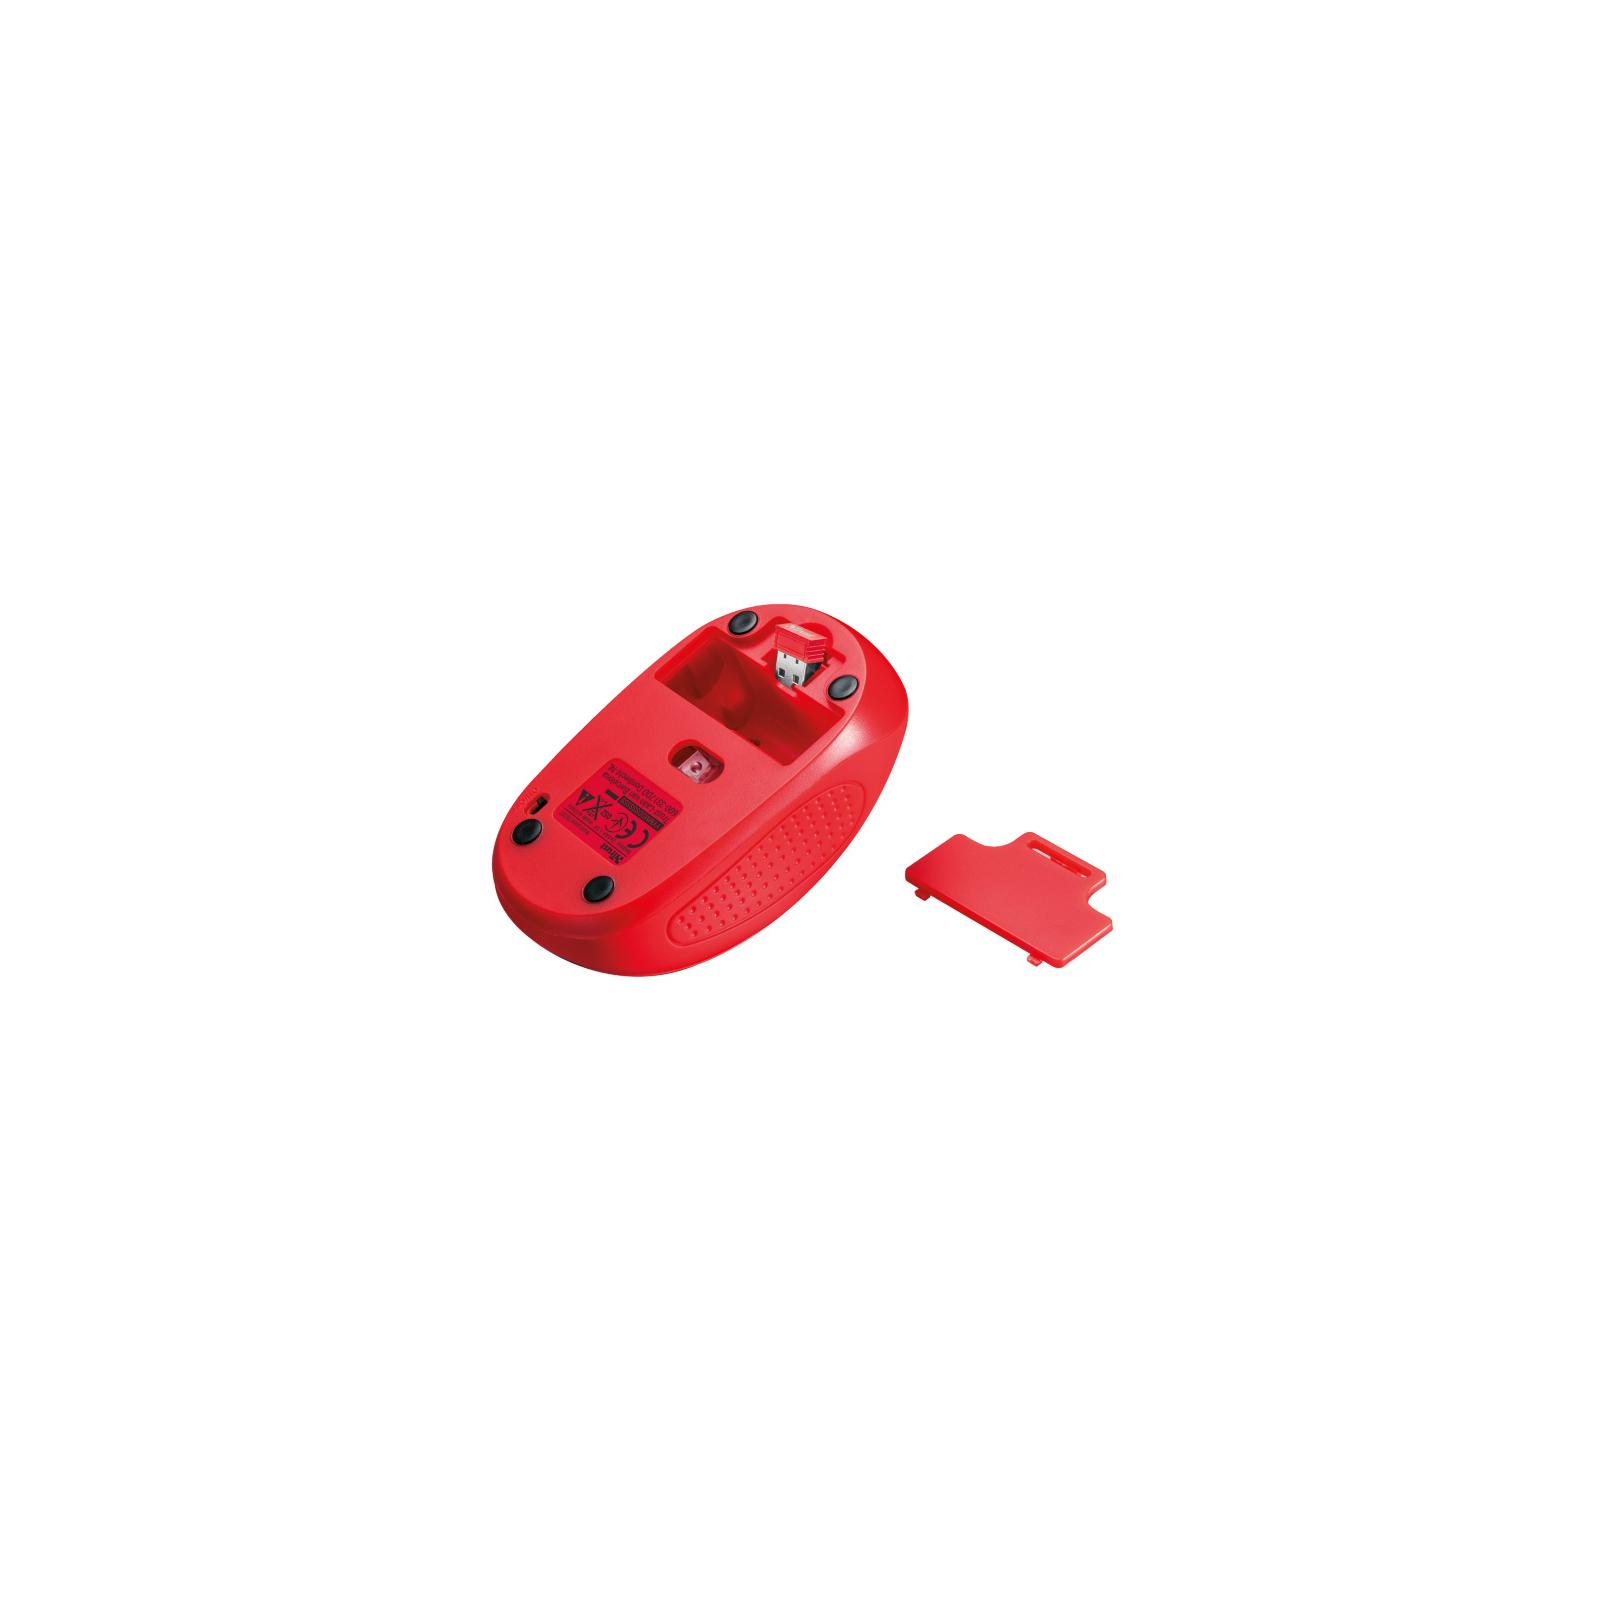 Мышка Trust Primo Wireless Mouse Red (20787) изображение 4